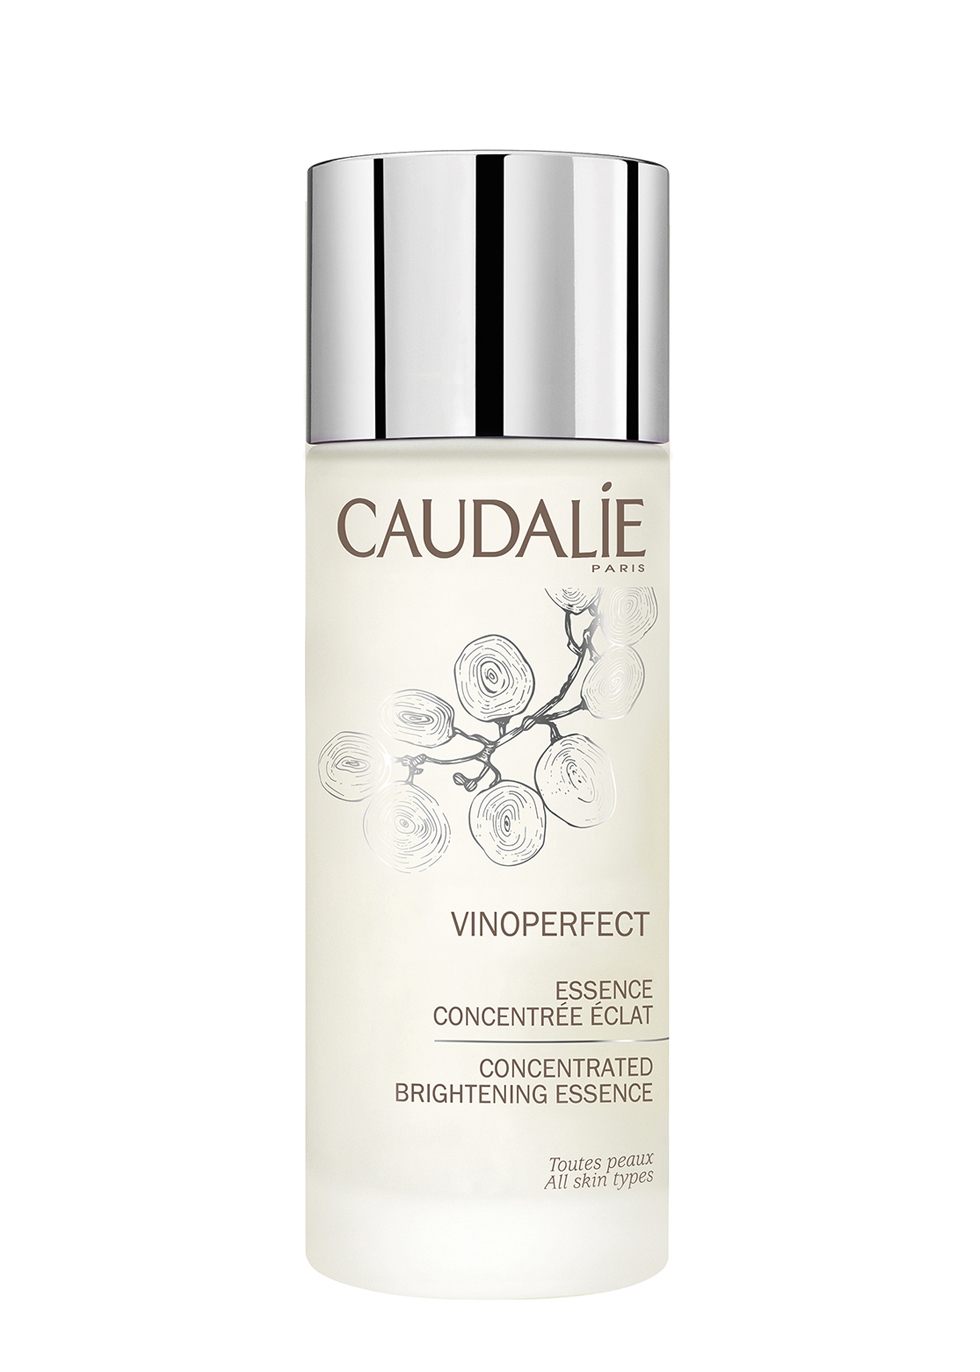 Vinoperfect Concentrated Brightening Essence 100ml - CAUDALIE